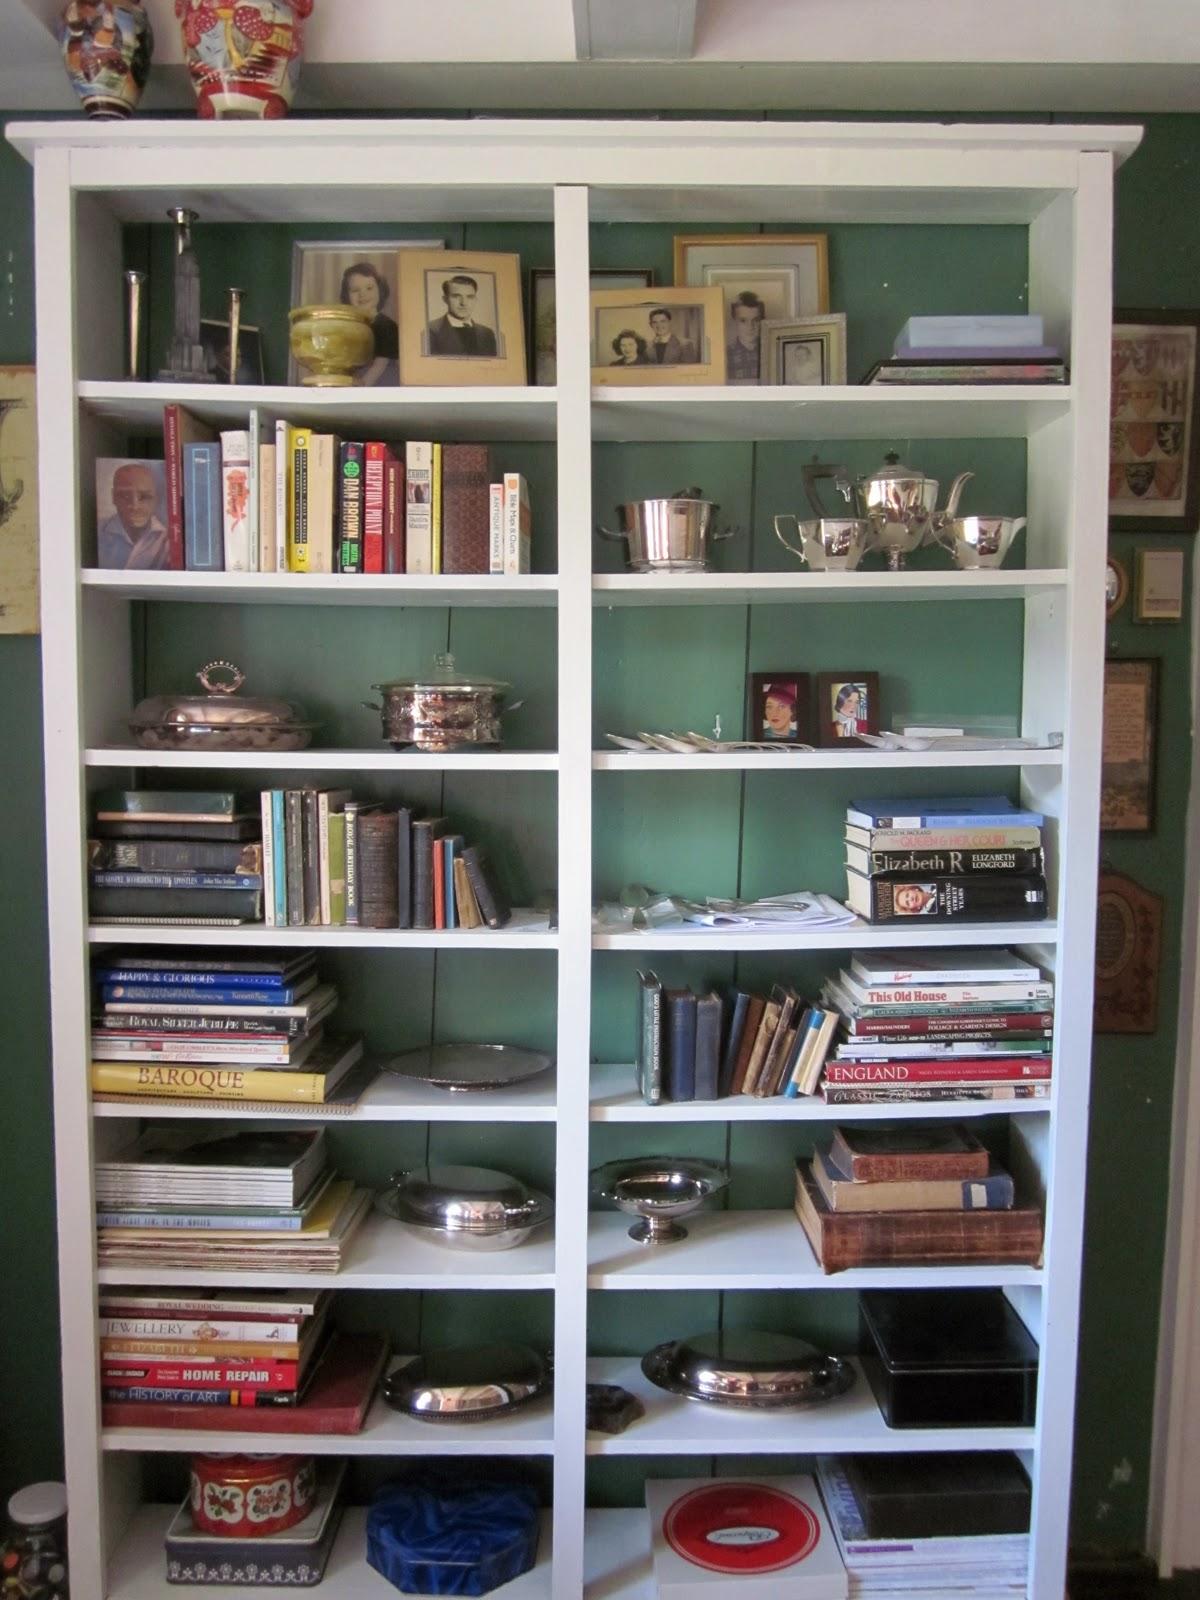 http://3.bp.blogspot.com/_EePxtUMCmnY/TO8Xs1_V8jI/AAAAAAAABXc/QpRPZ-9hYEw/s1600/bookcase+done.jpg